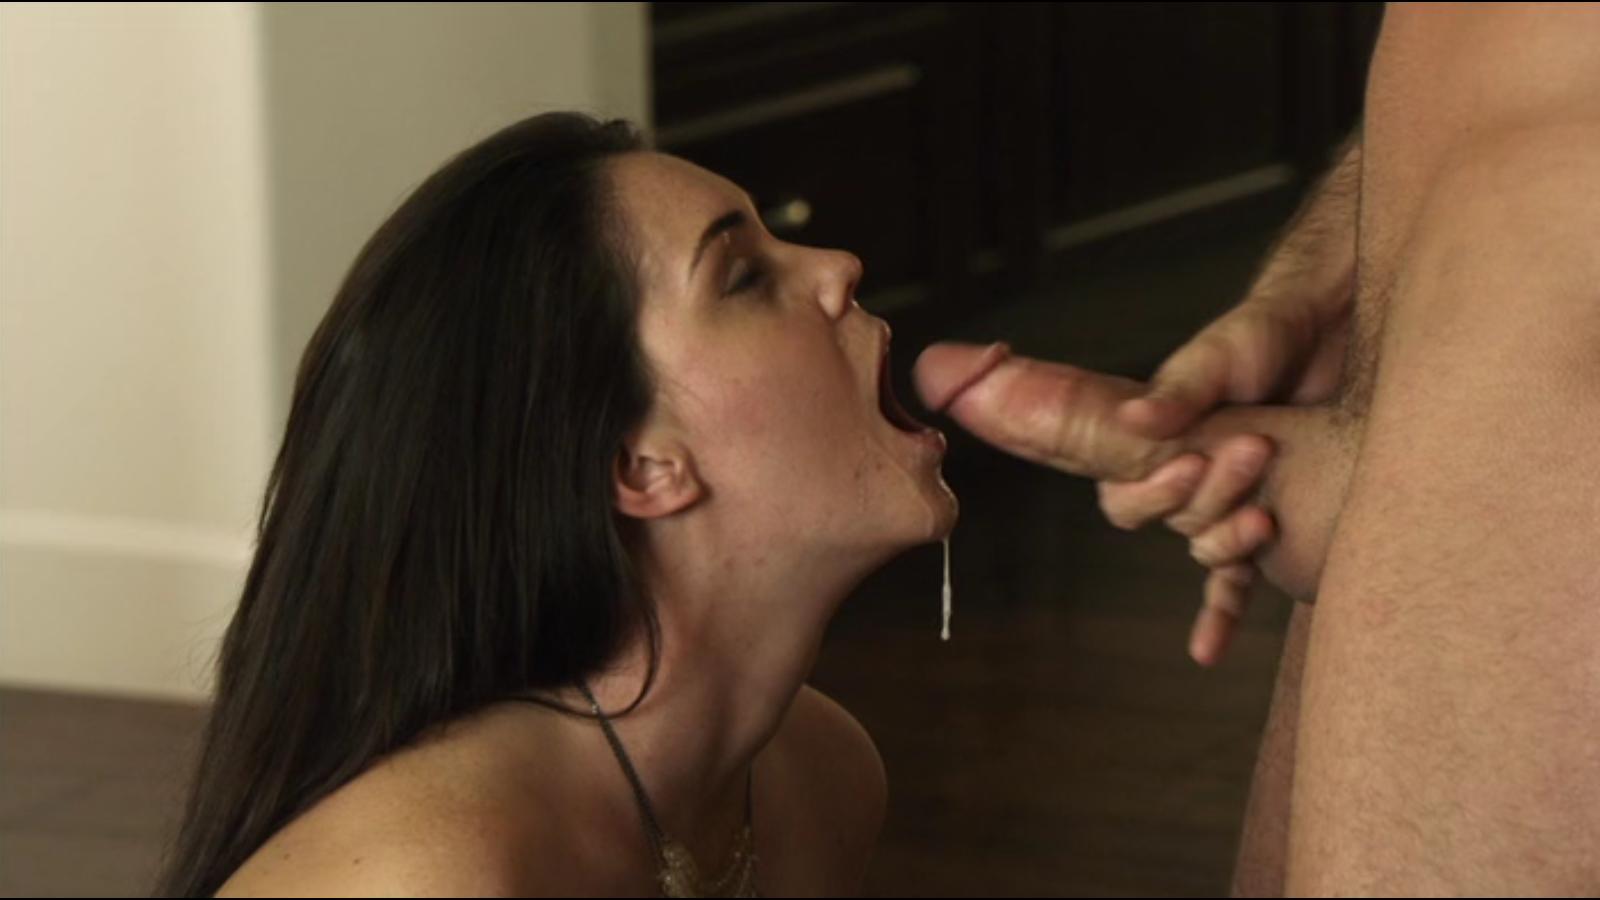 don't fuck my sister - scene #2 - alison tyler | true pornstar